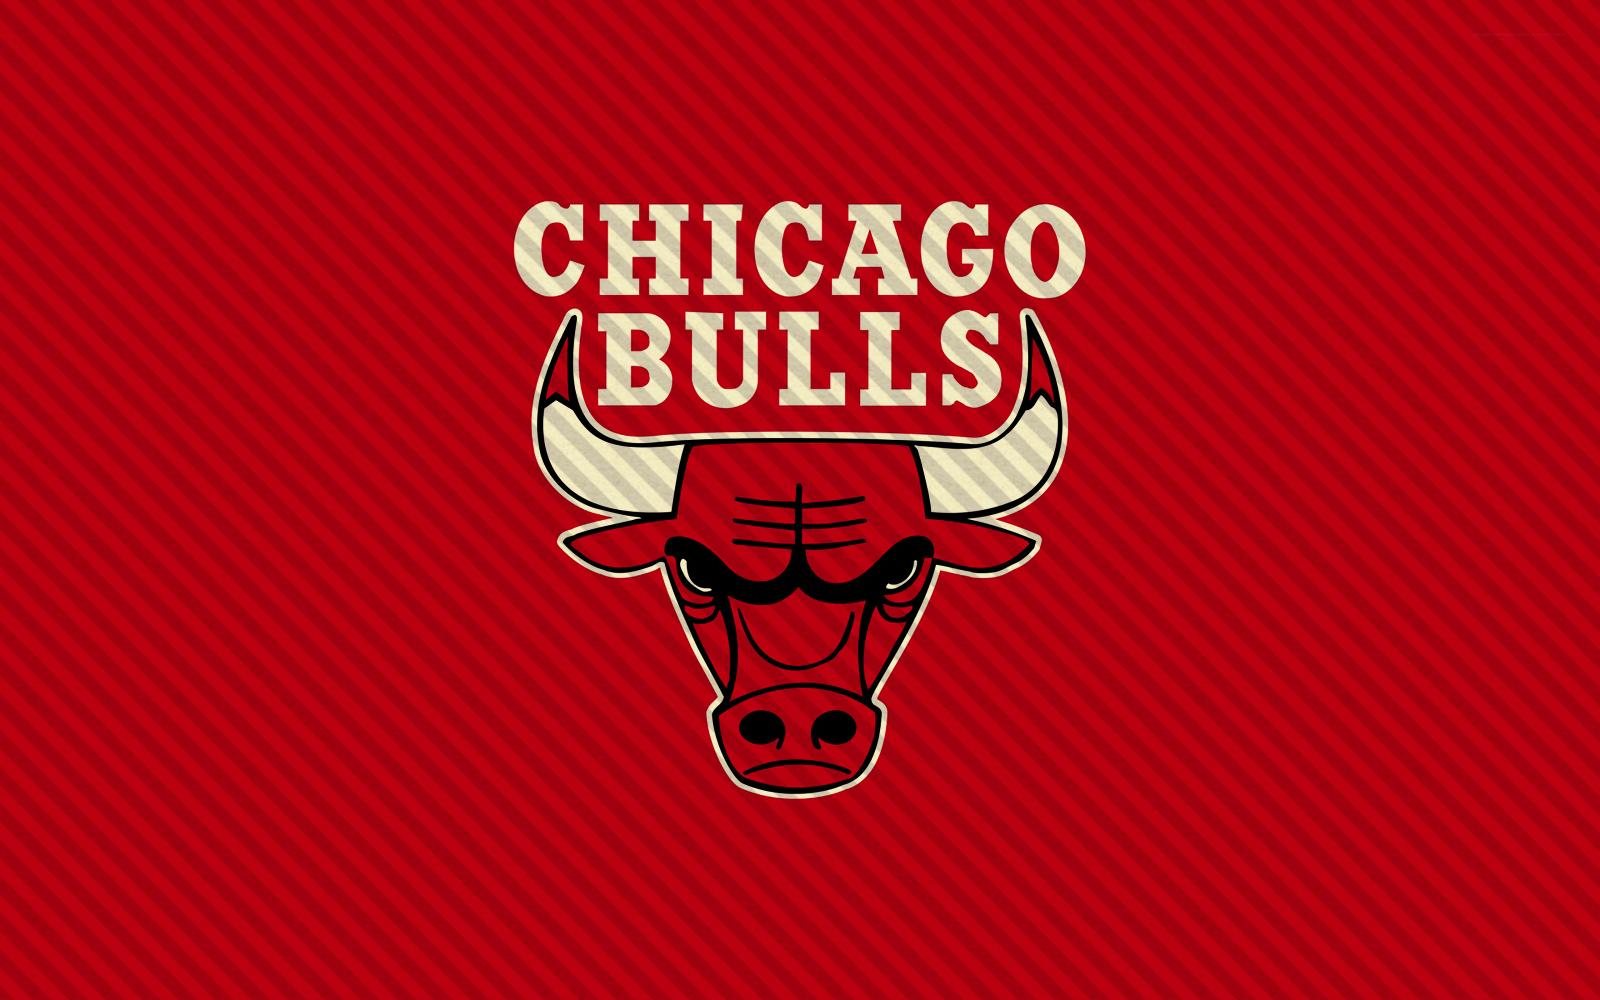 NBA Chicago Bulls Basketball Team Logo HD Wallpapers| HD Wallpapers ,Backgrounds ,Photos ...